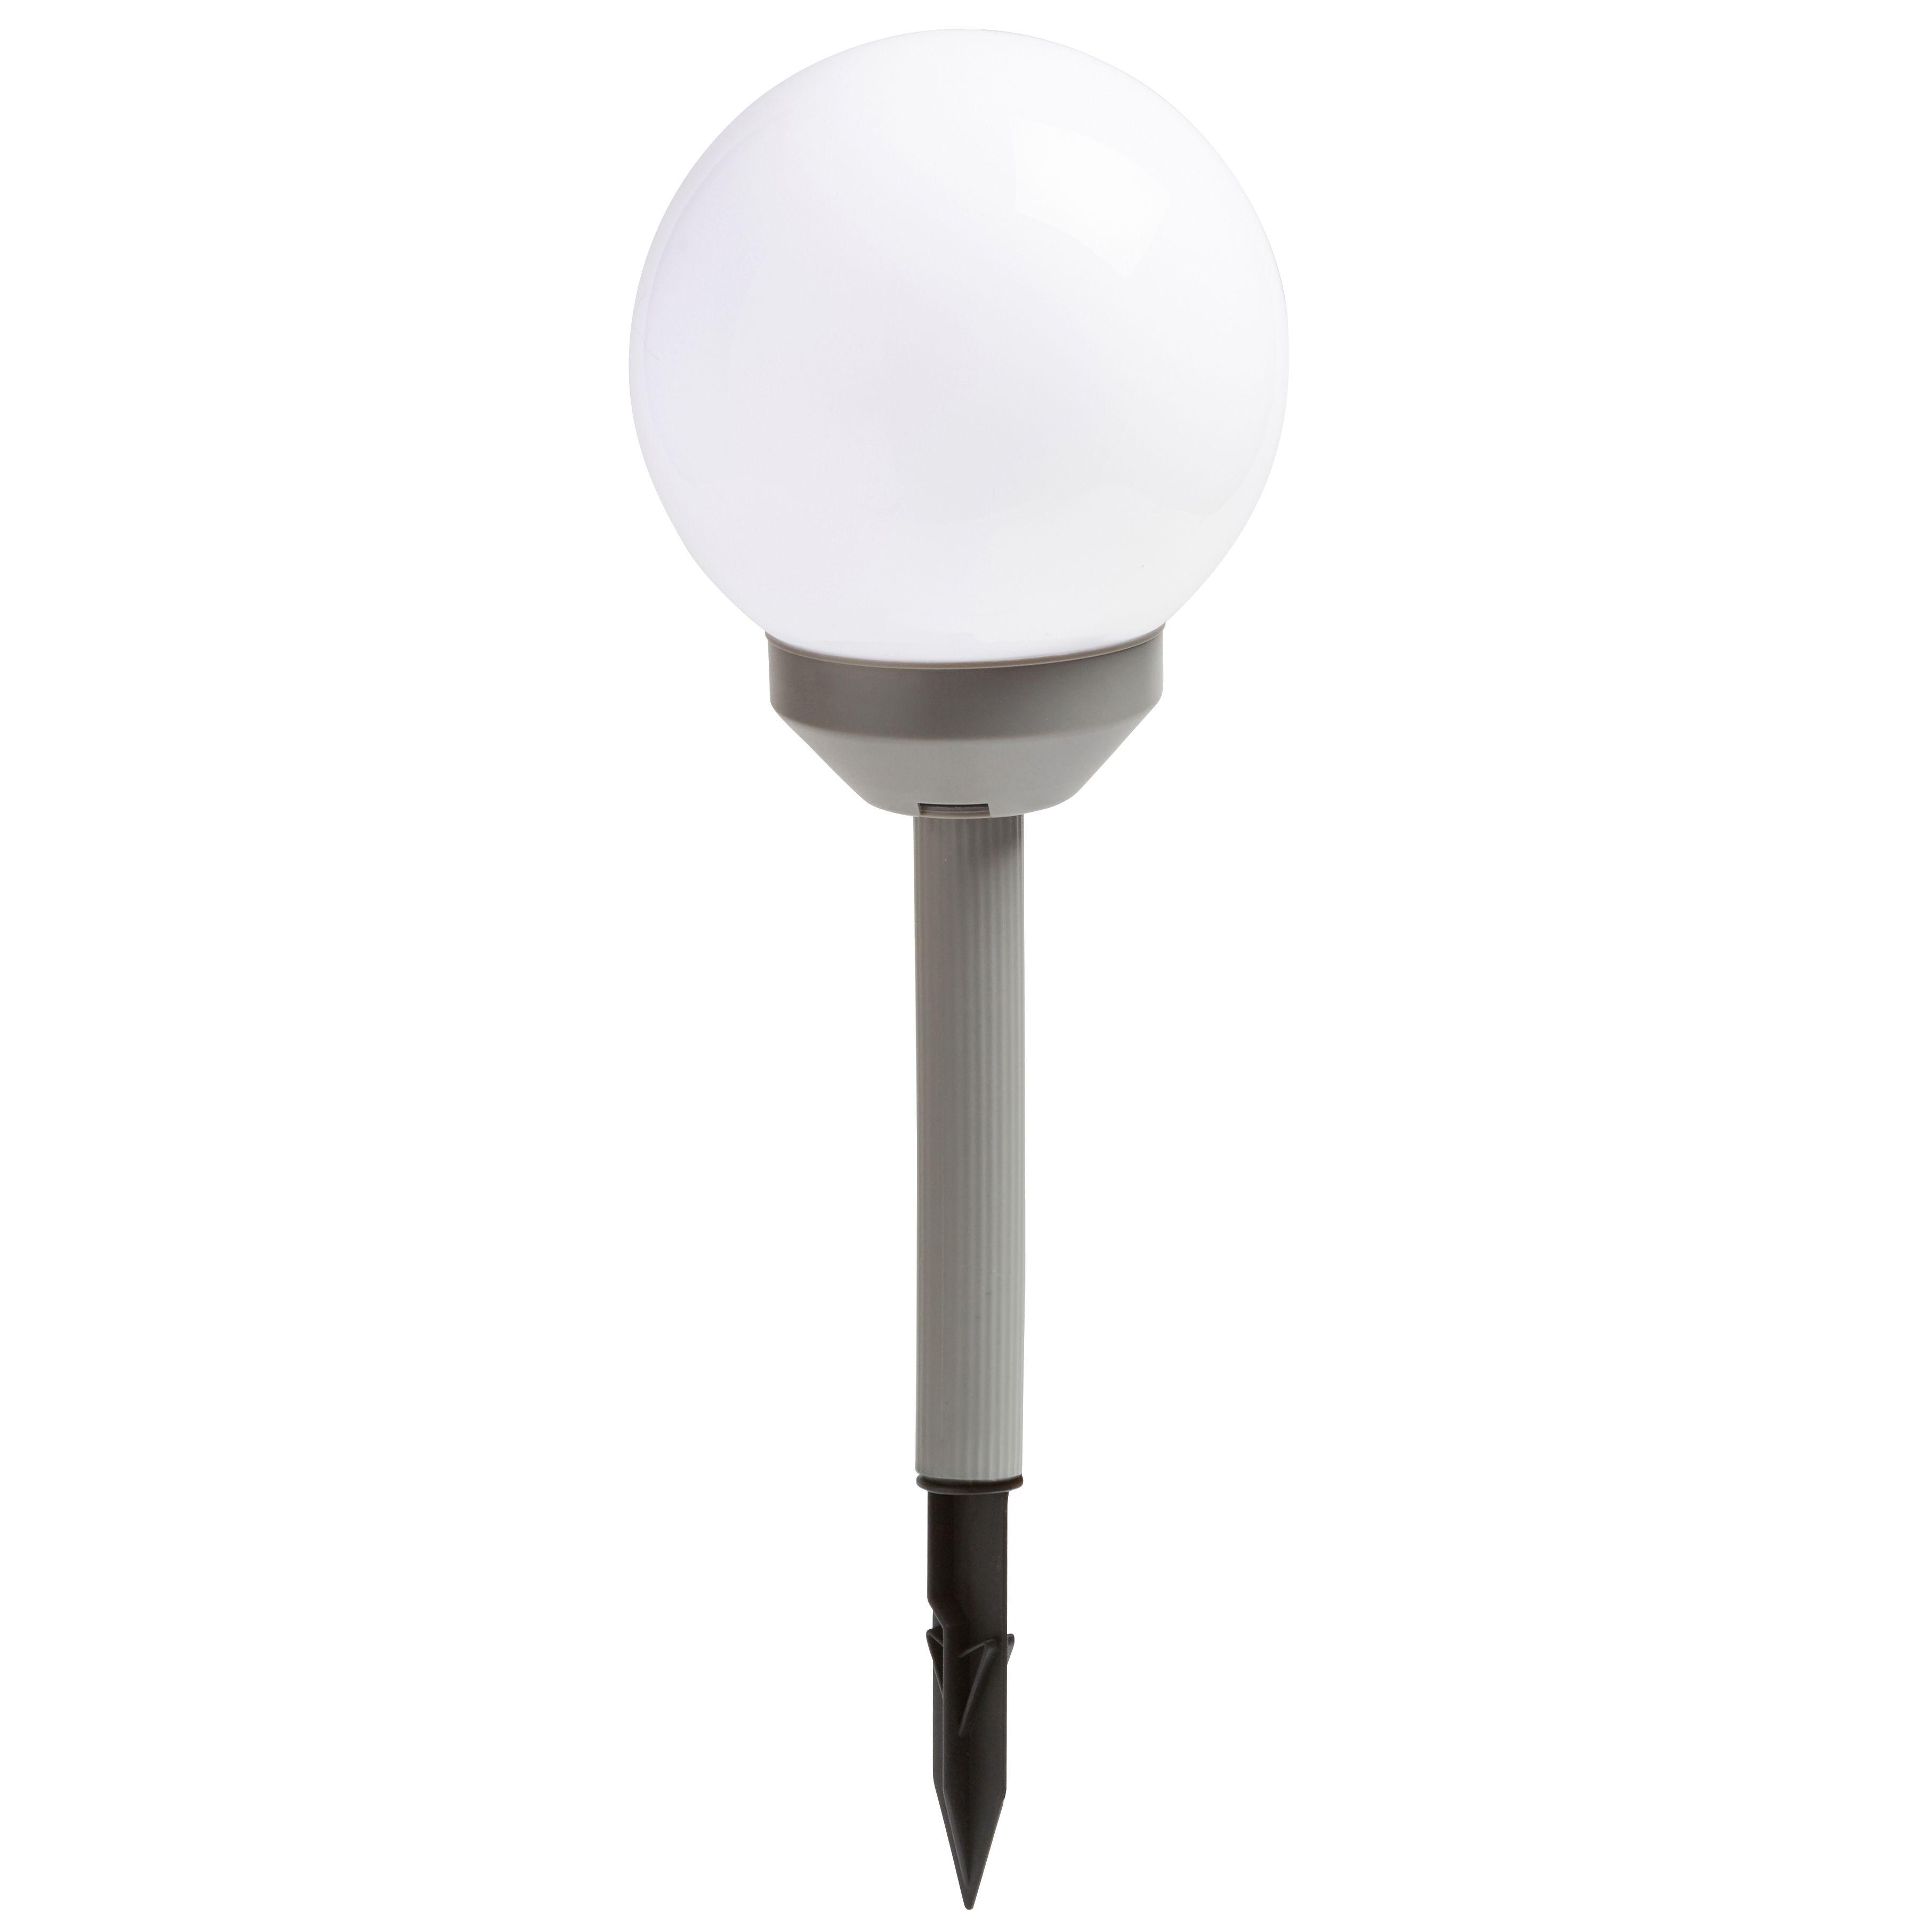 Solar Lights B Q: Blooma Nessus 2-In-1 Solar Powered LED Globe Light